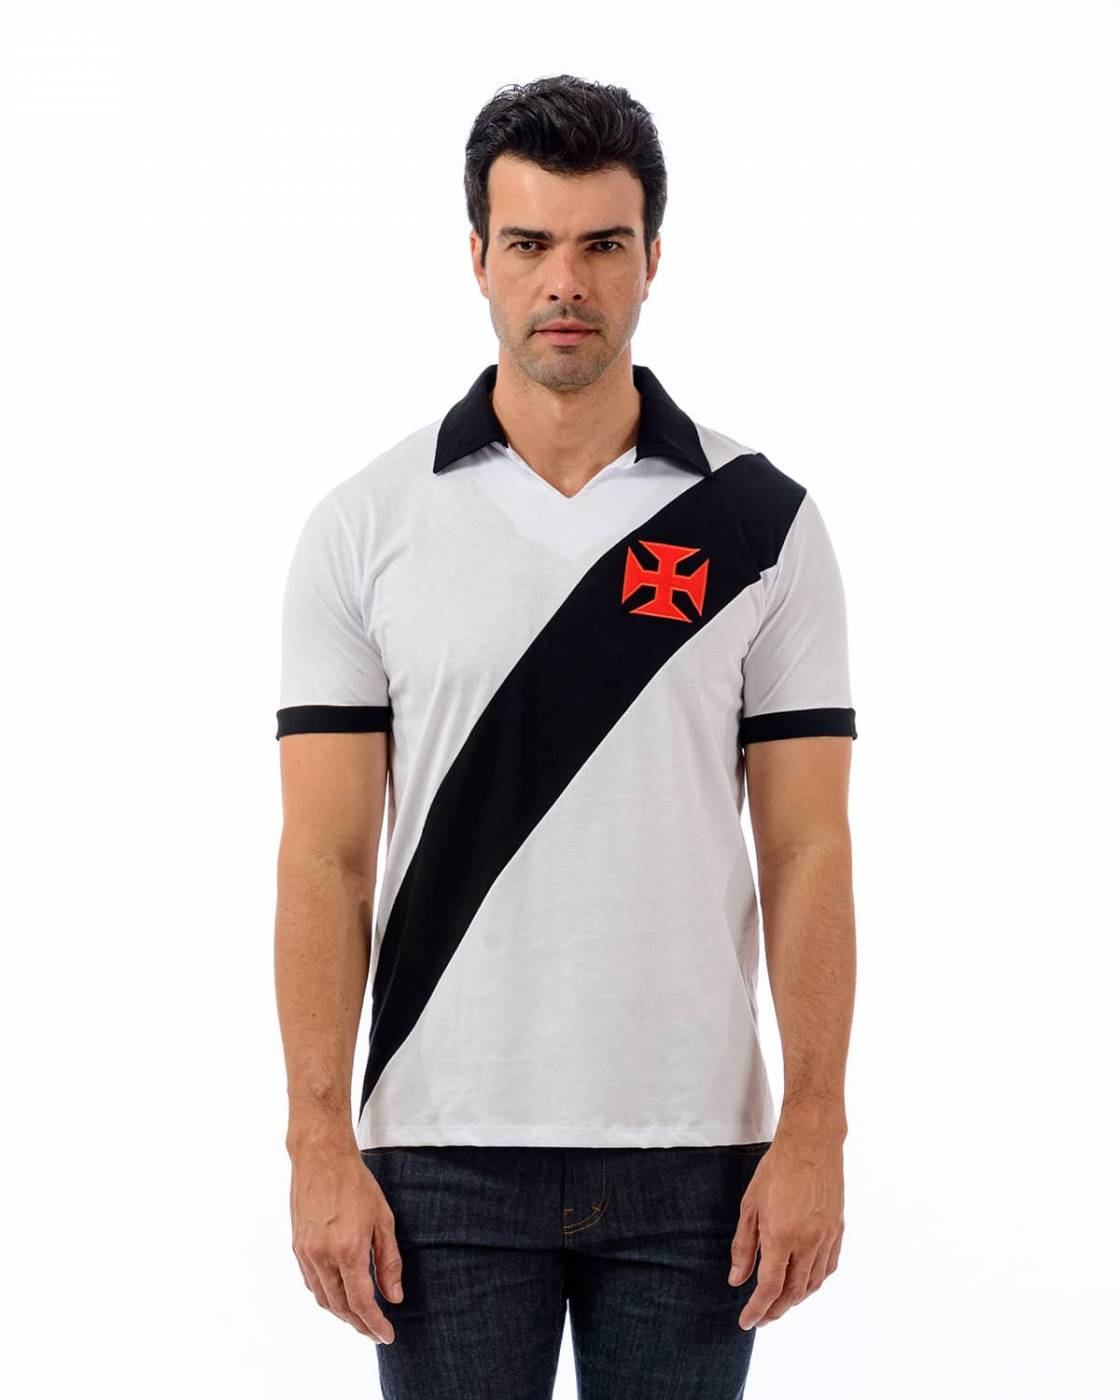 Camisa Polo Vasco Paris - Branca